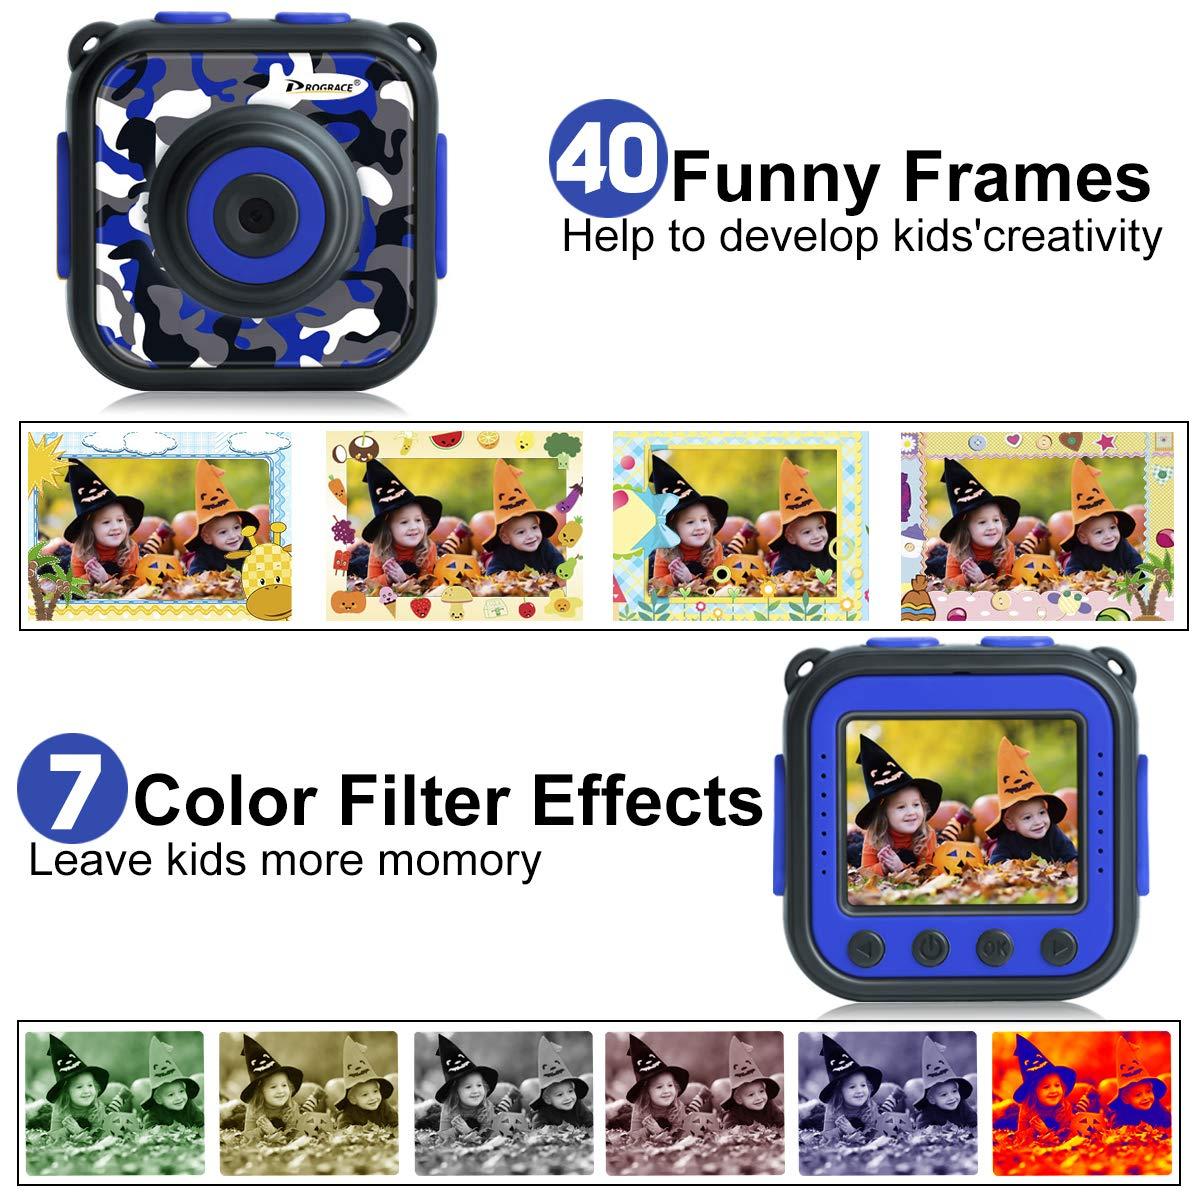 PROGRACE Children Kids Camera Waterproof Digital Video HD Action Camera 1080P Sports Camera Camcorder DV for Boys Birthday Learn Camera Toy 1.77\'\' LCD Screen